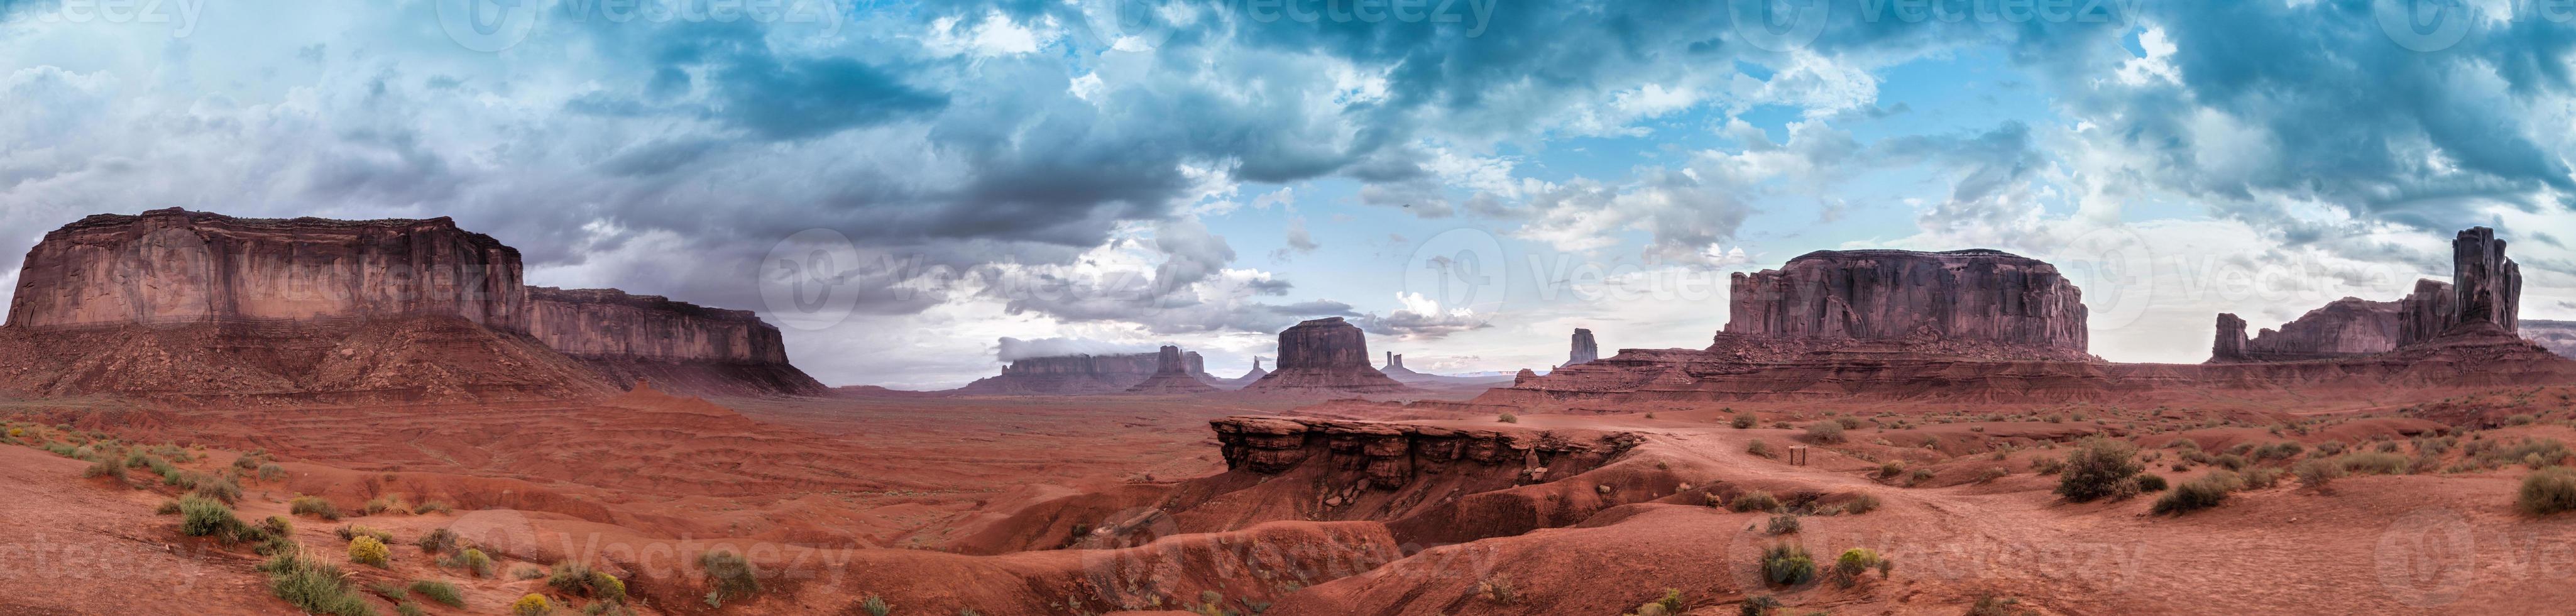 monument vallei panorama skyline foto